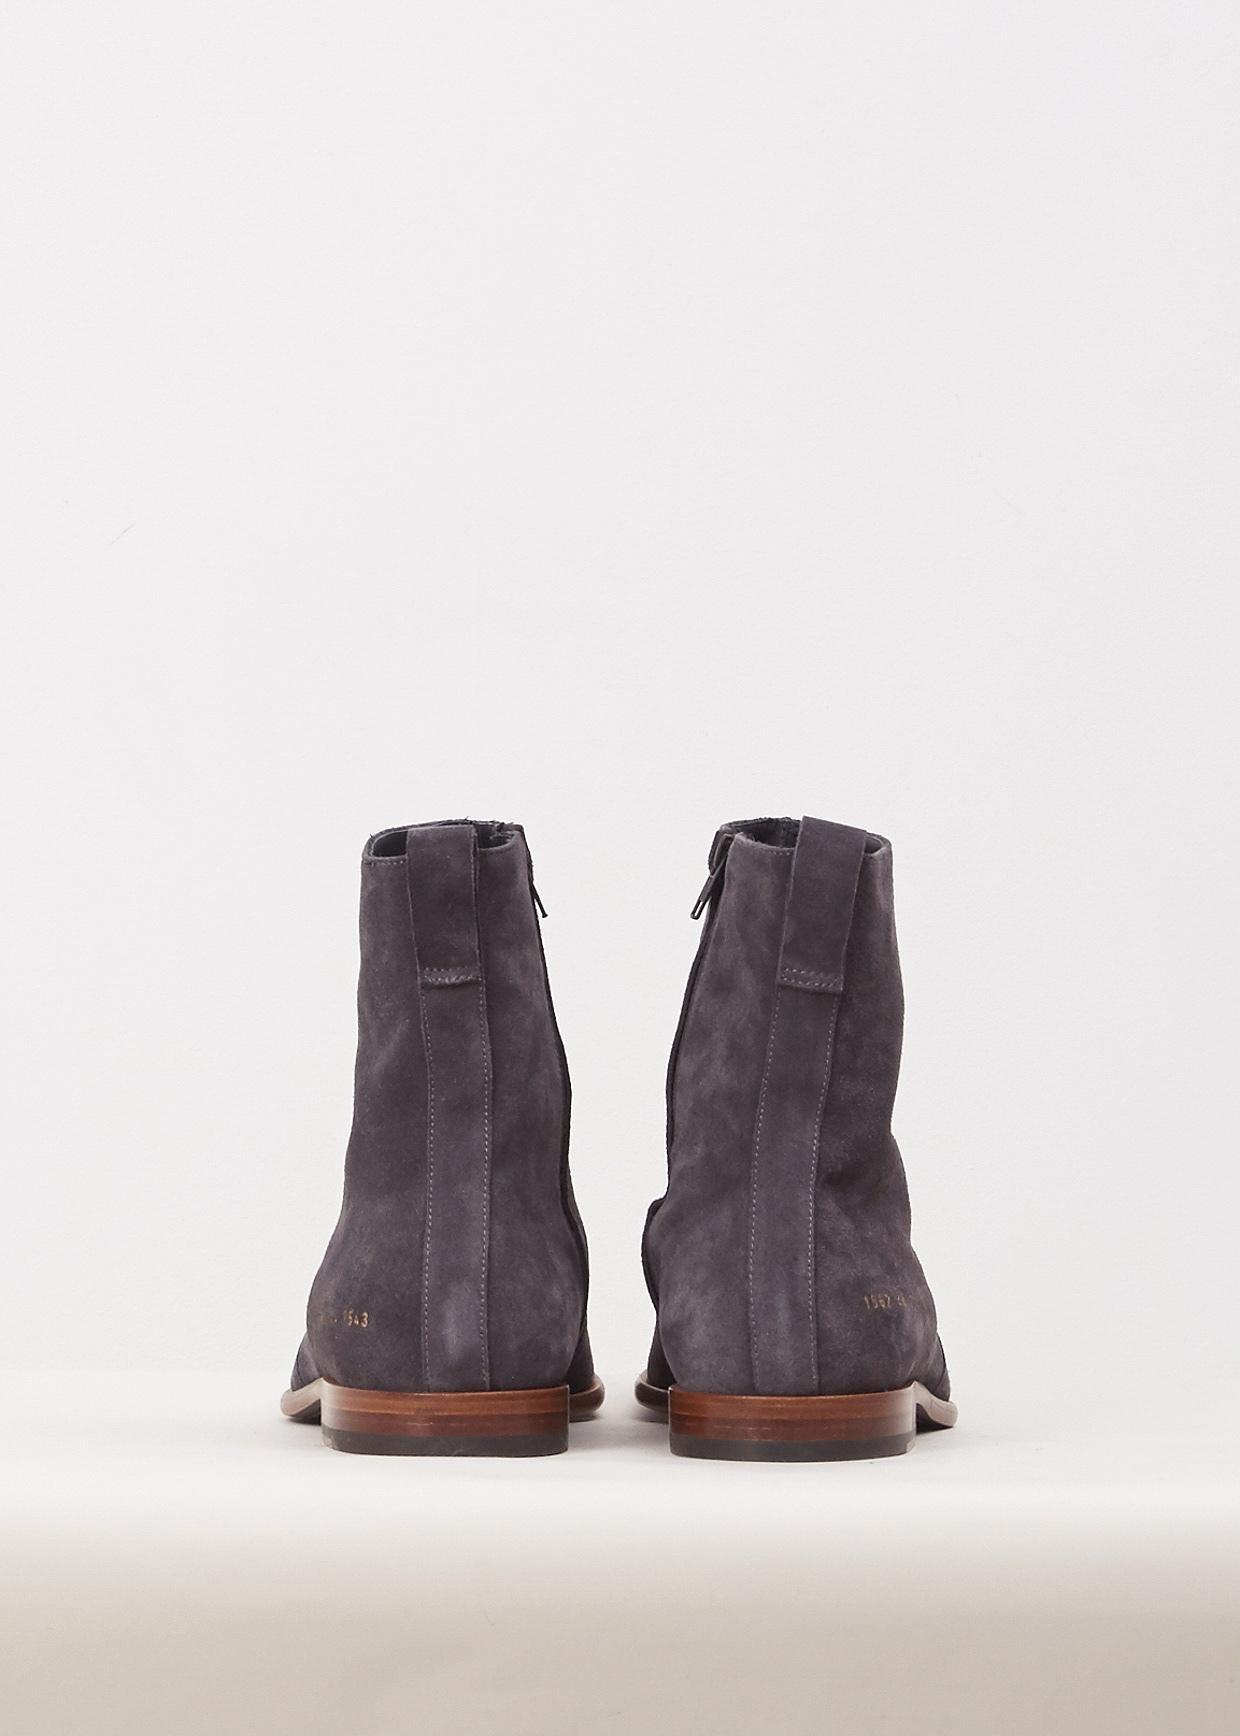 Robert Geller Charcoal Common Projects Chelsea Boots In